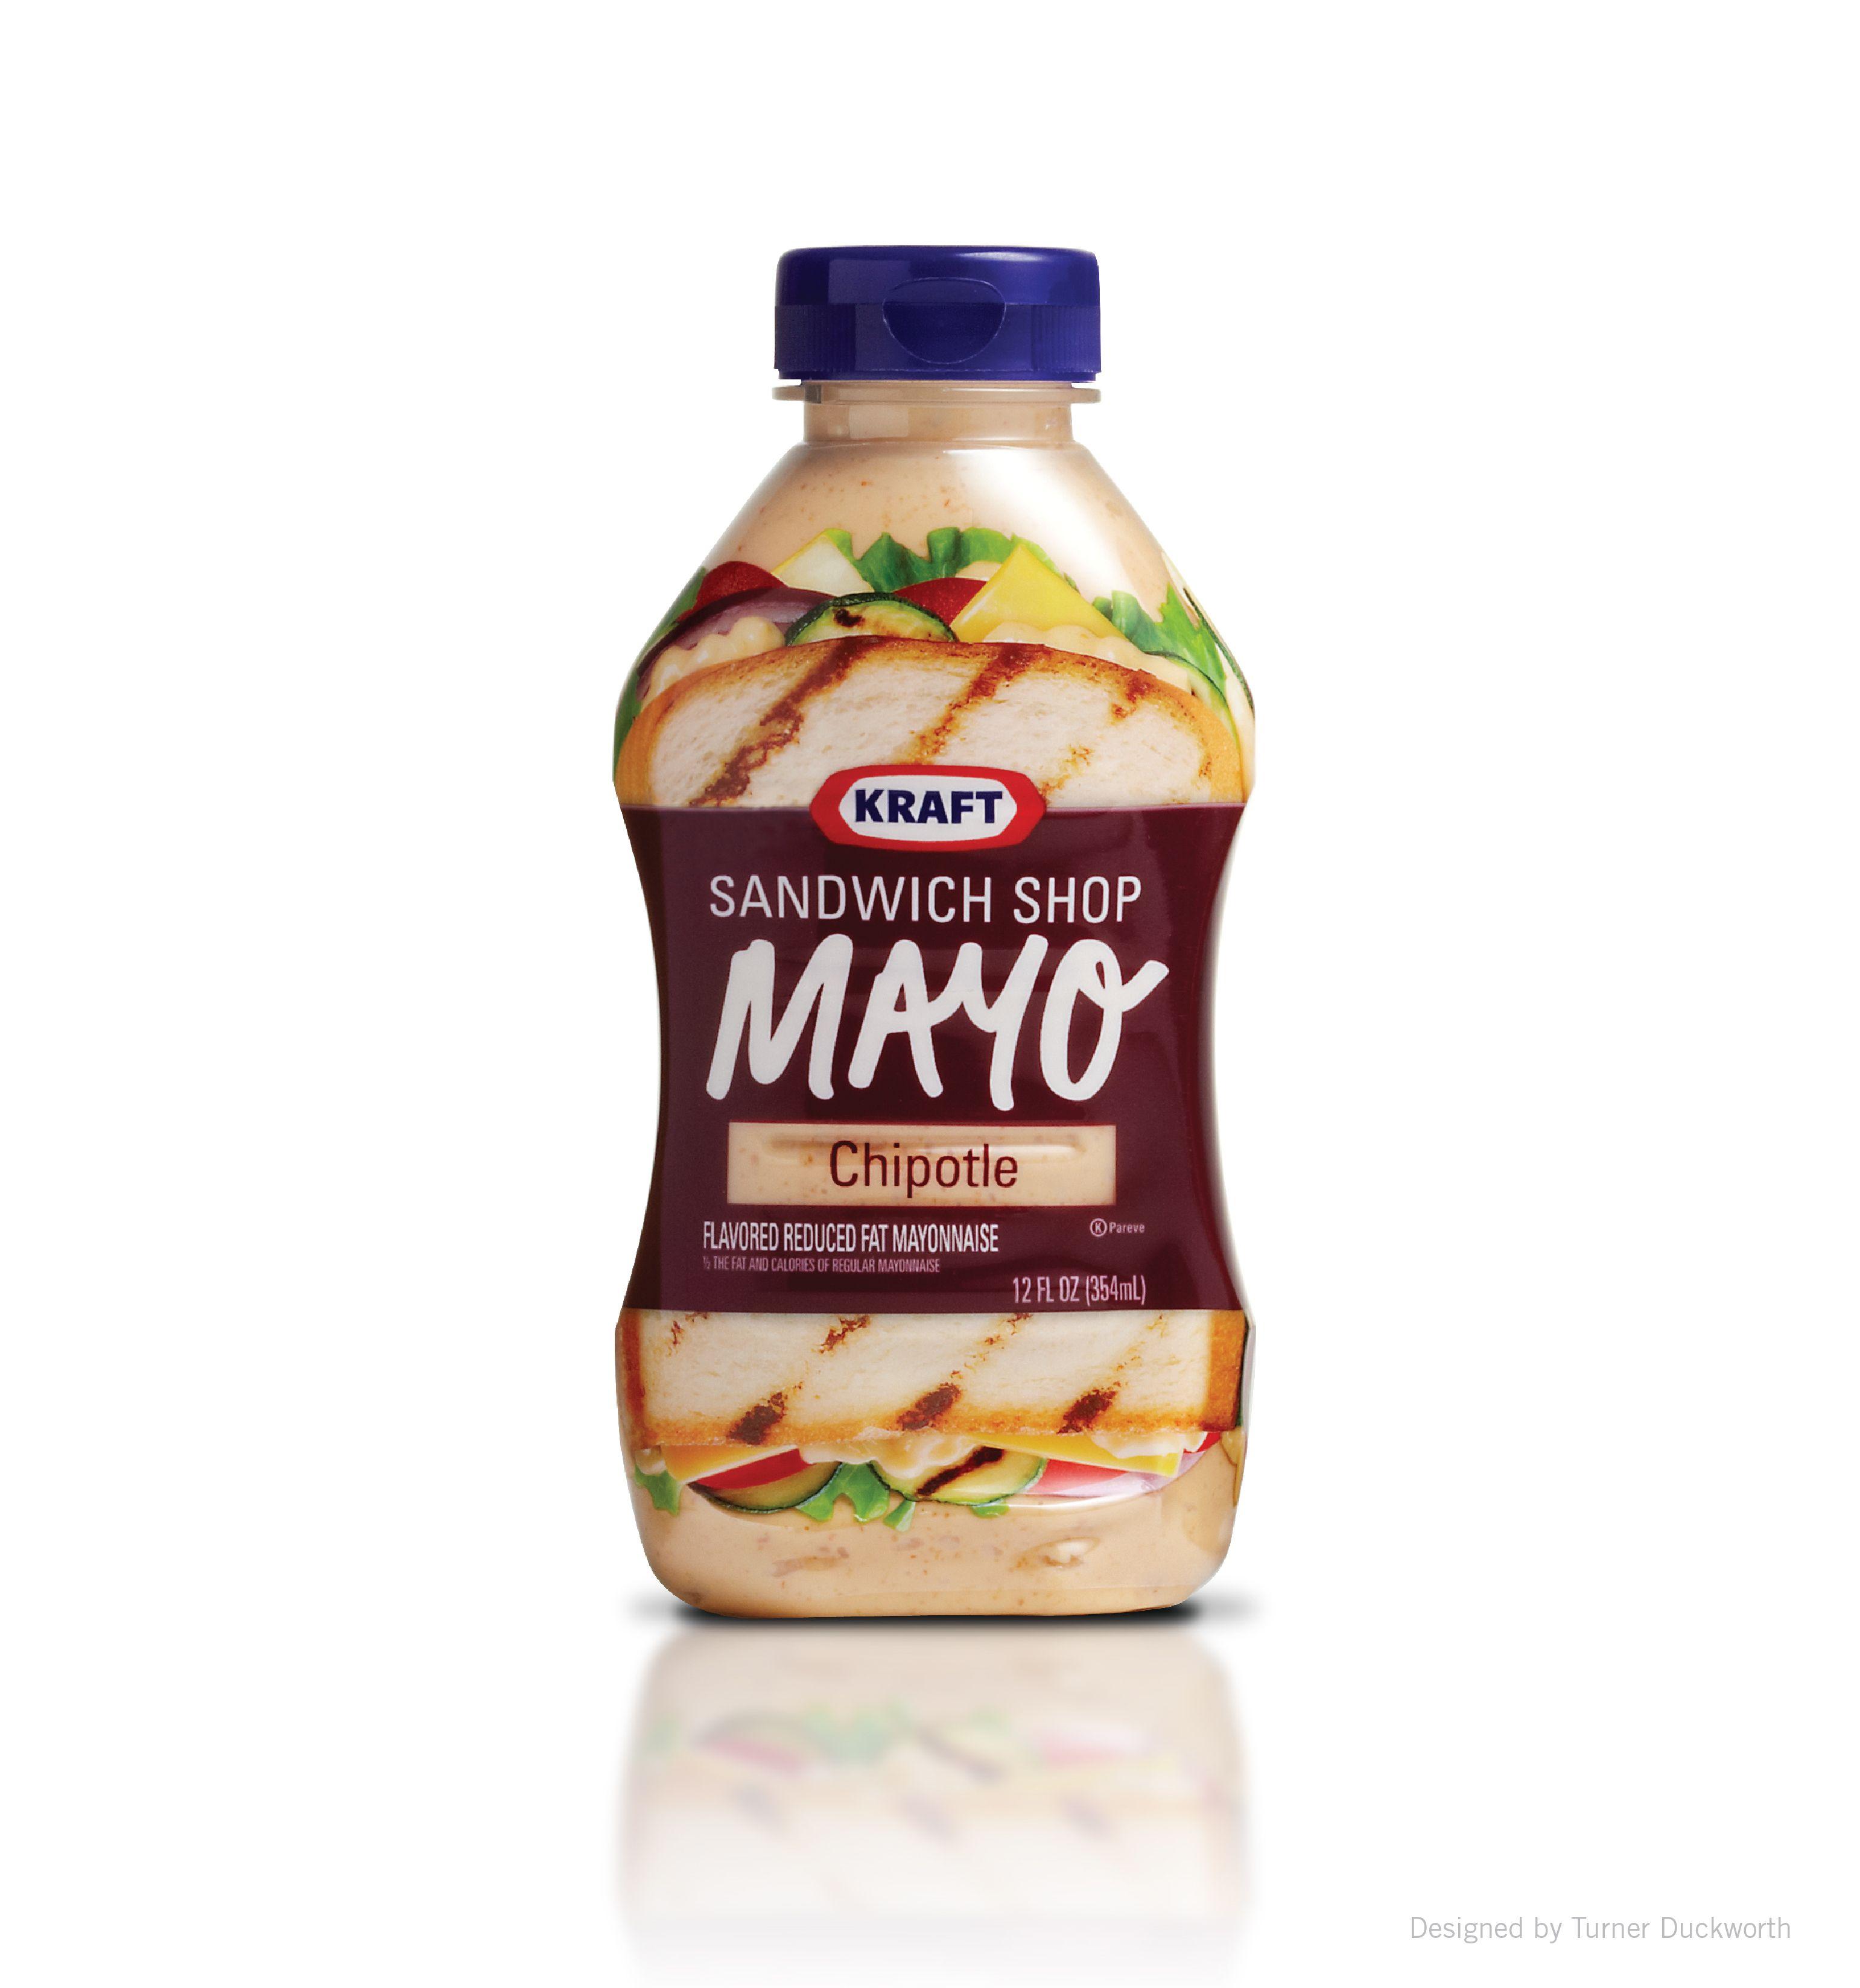 Kraft Mayo Sandwich Shop packaging. Designed by Turner